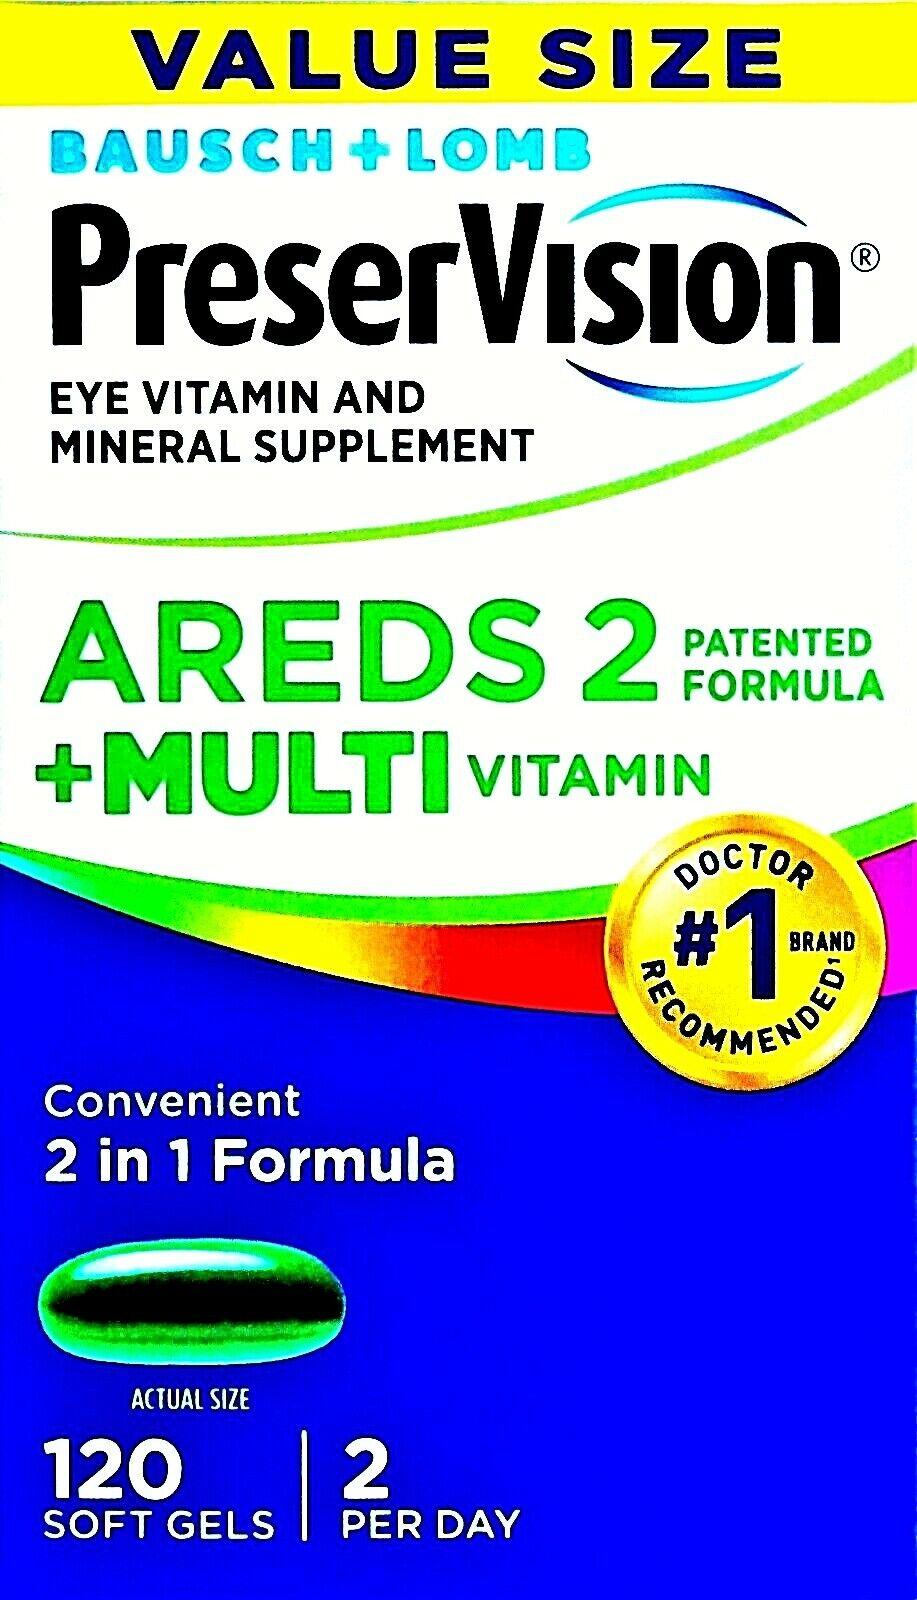 5X Areds 2 plus multivitamin eye health vitamins vision care